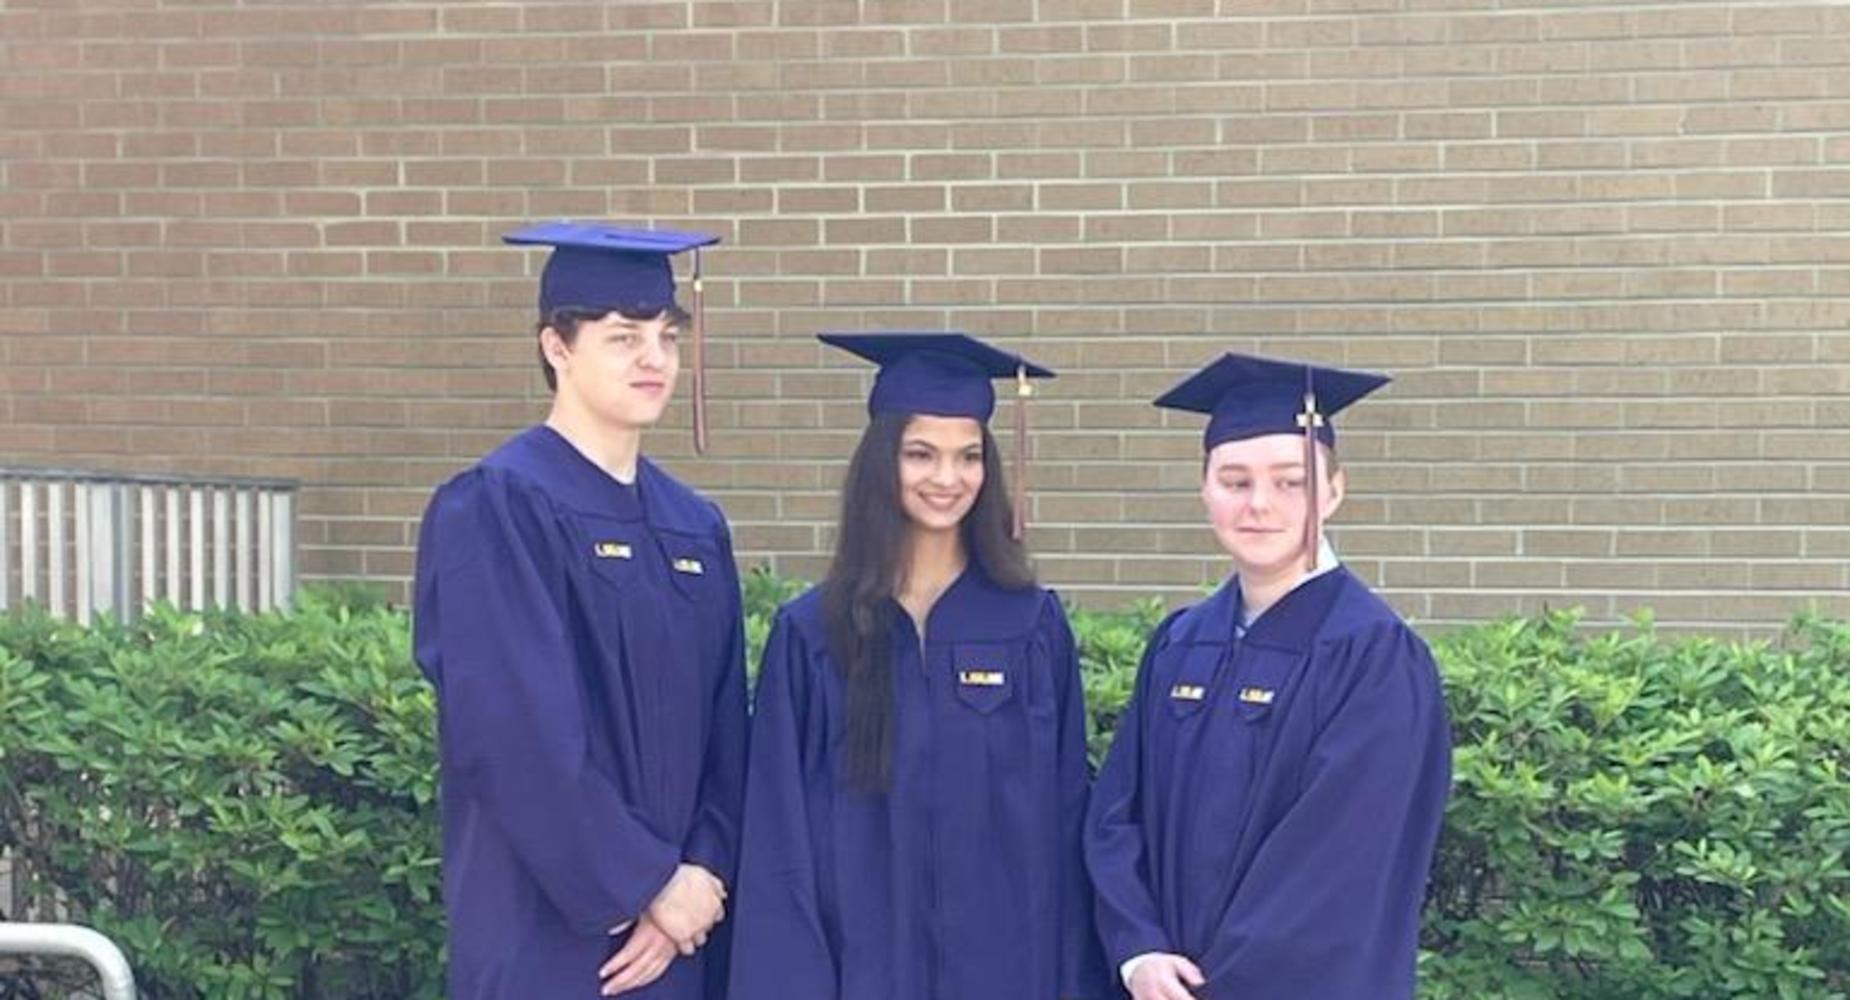 LSUE Associate Degree Graduates